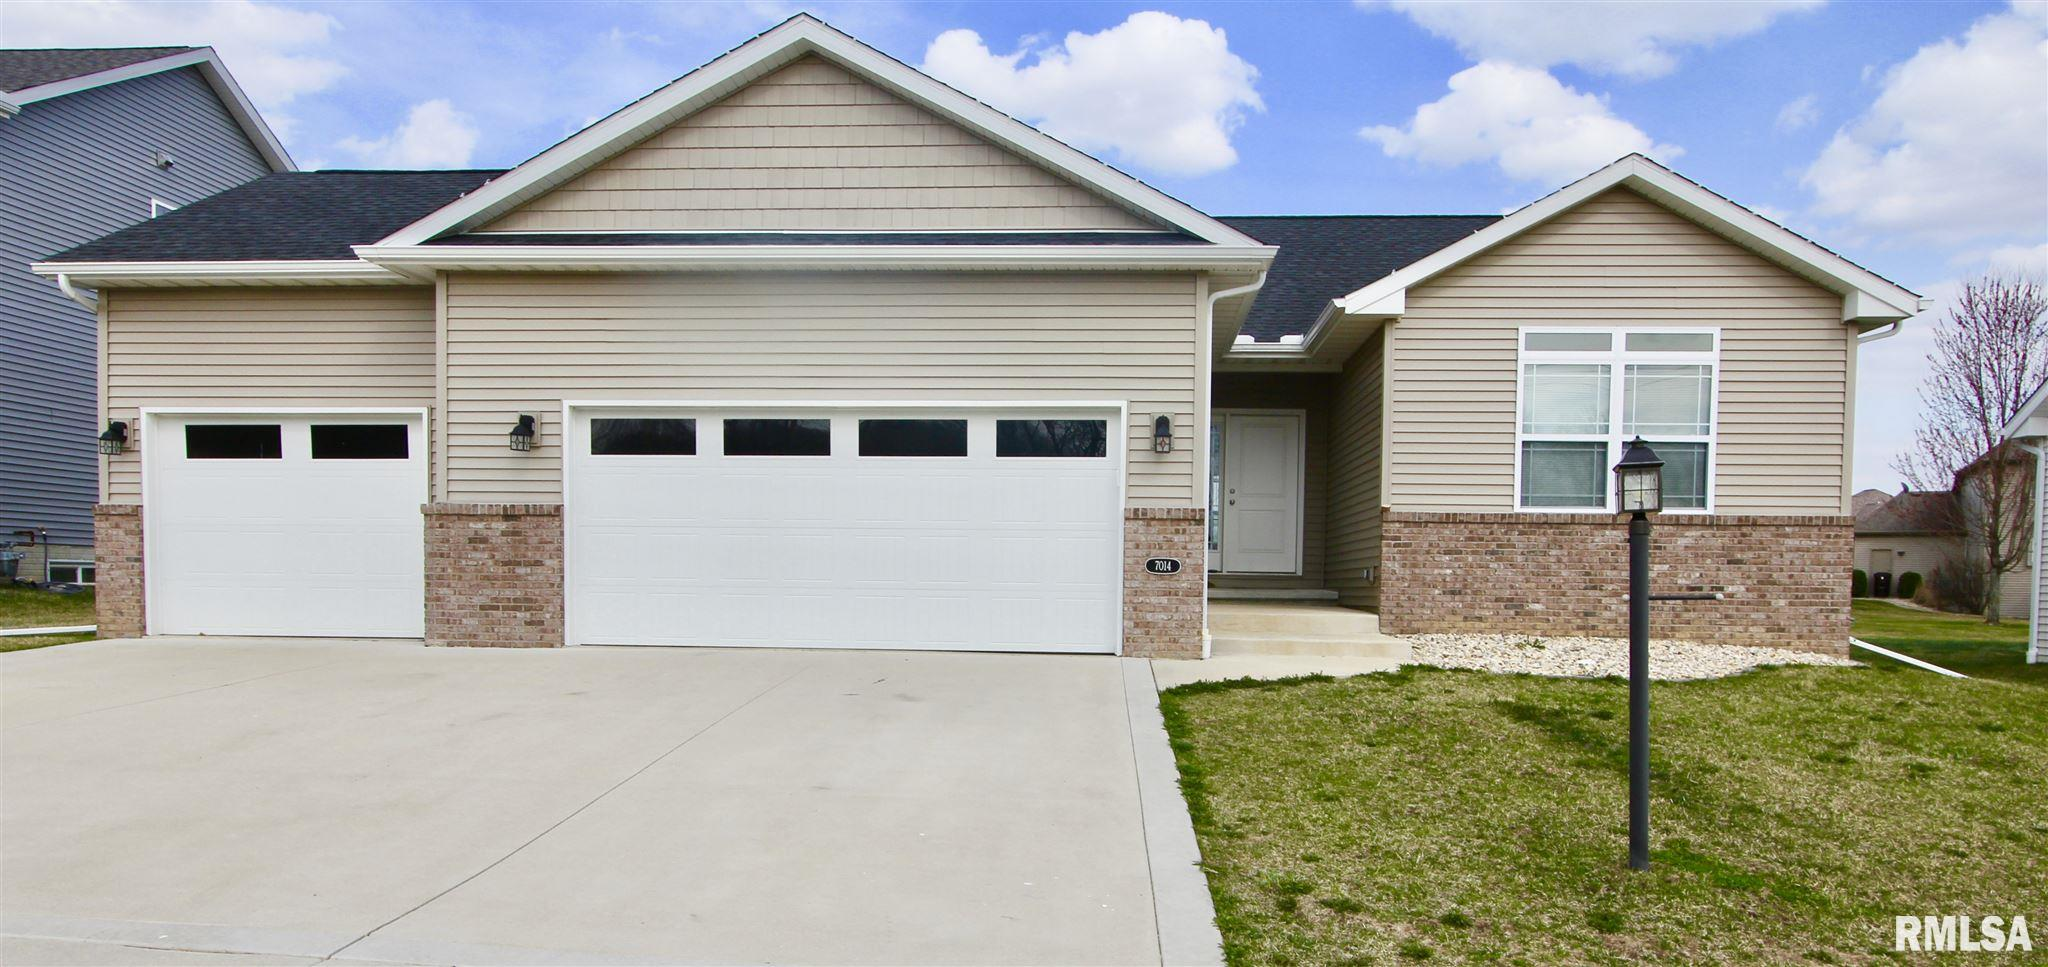 7014 N Water Oak Property Photo - Edwards, IL real estate listing